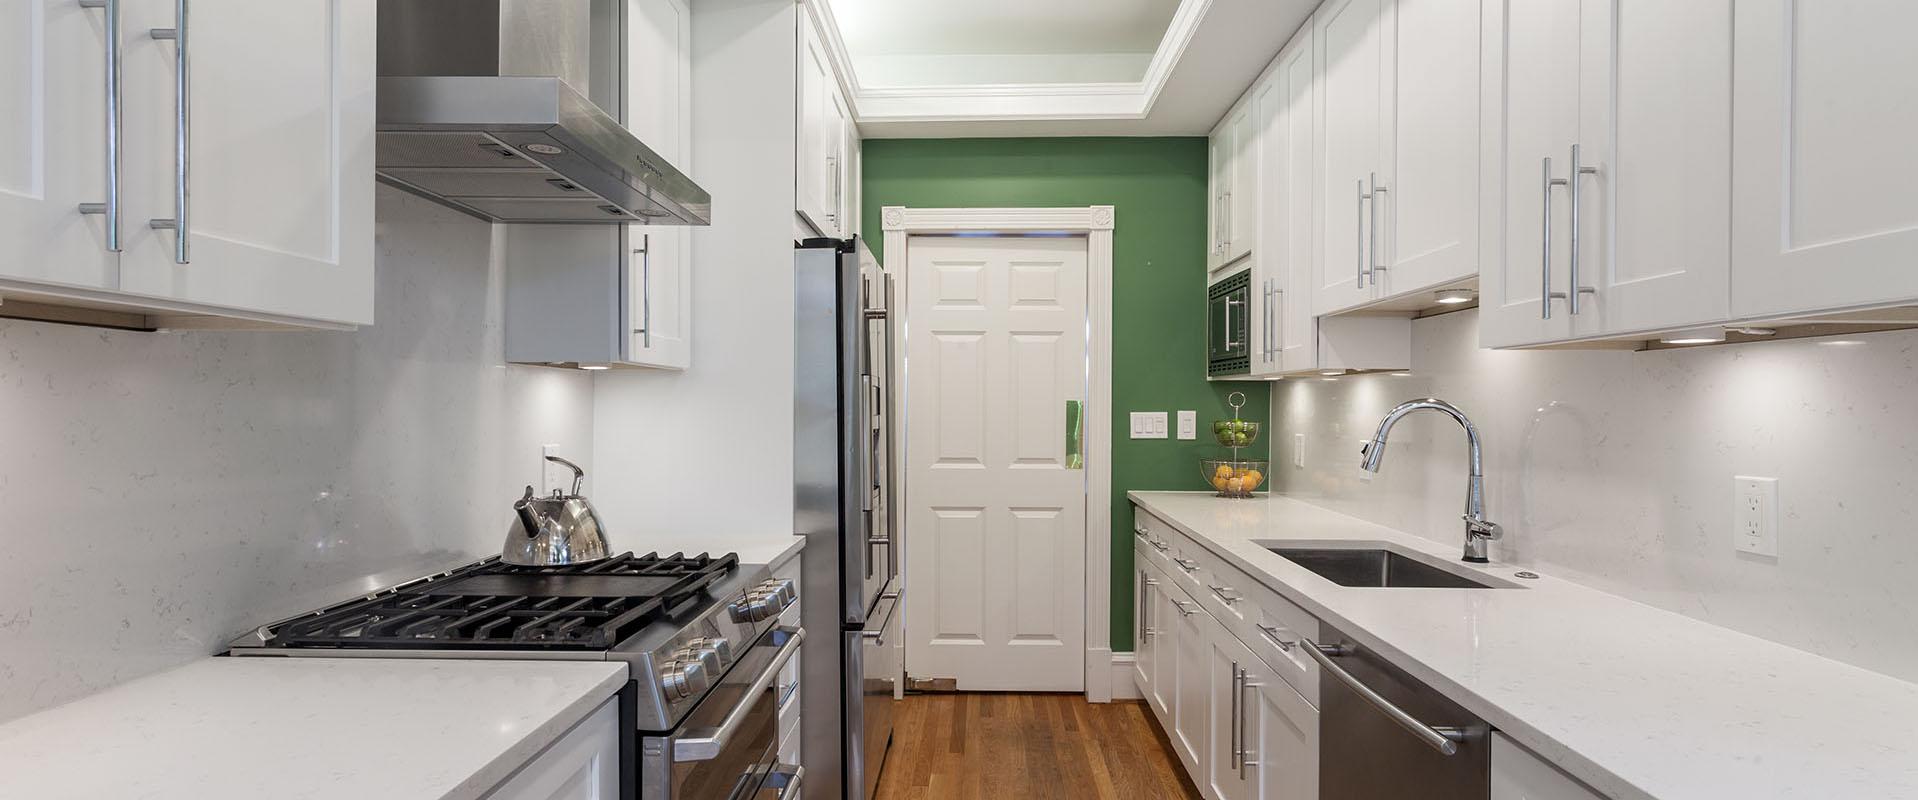 Kitchen Remodeling in Alexandria, VA